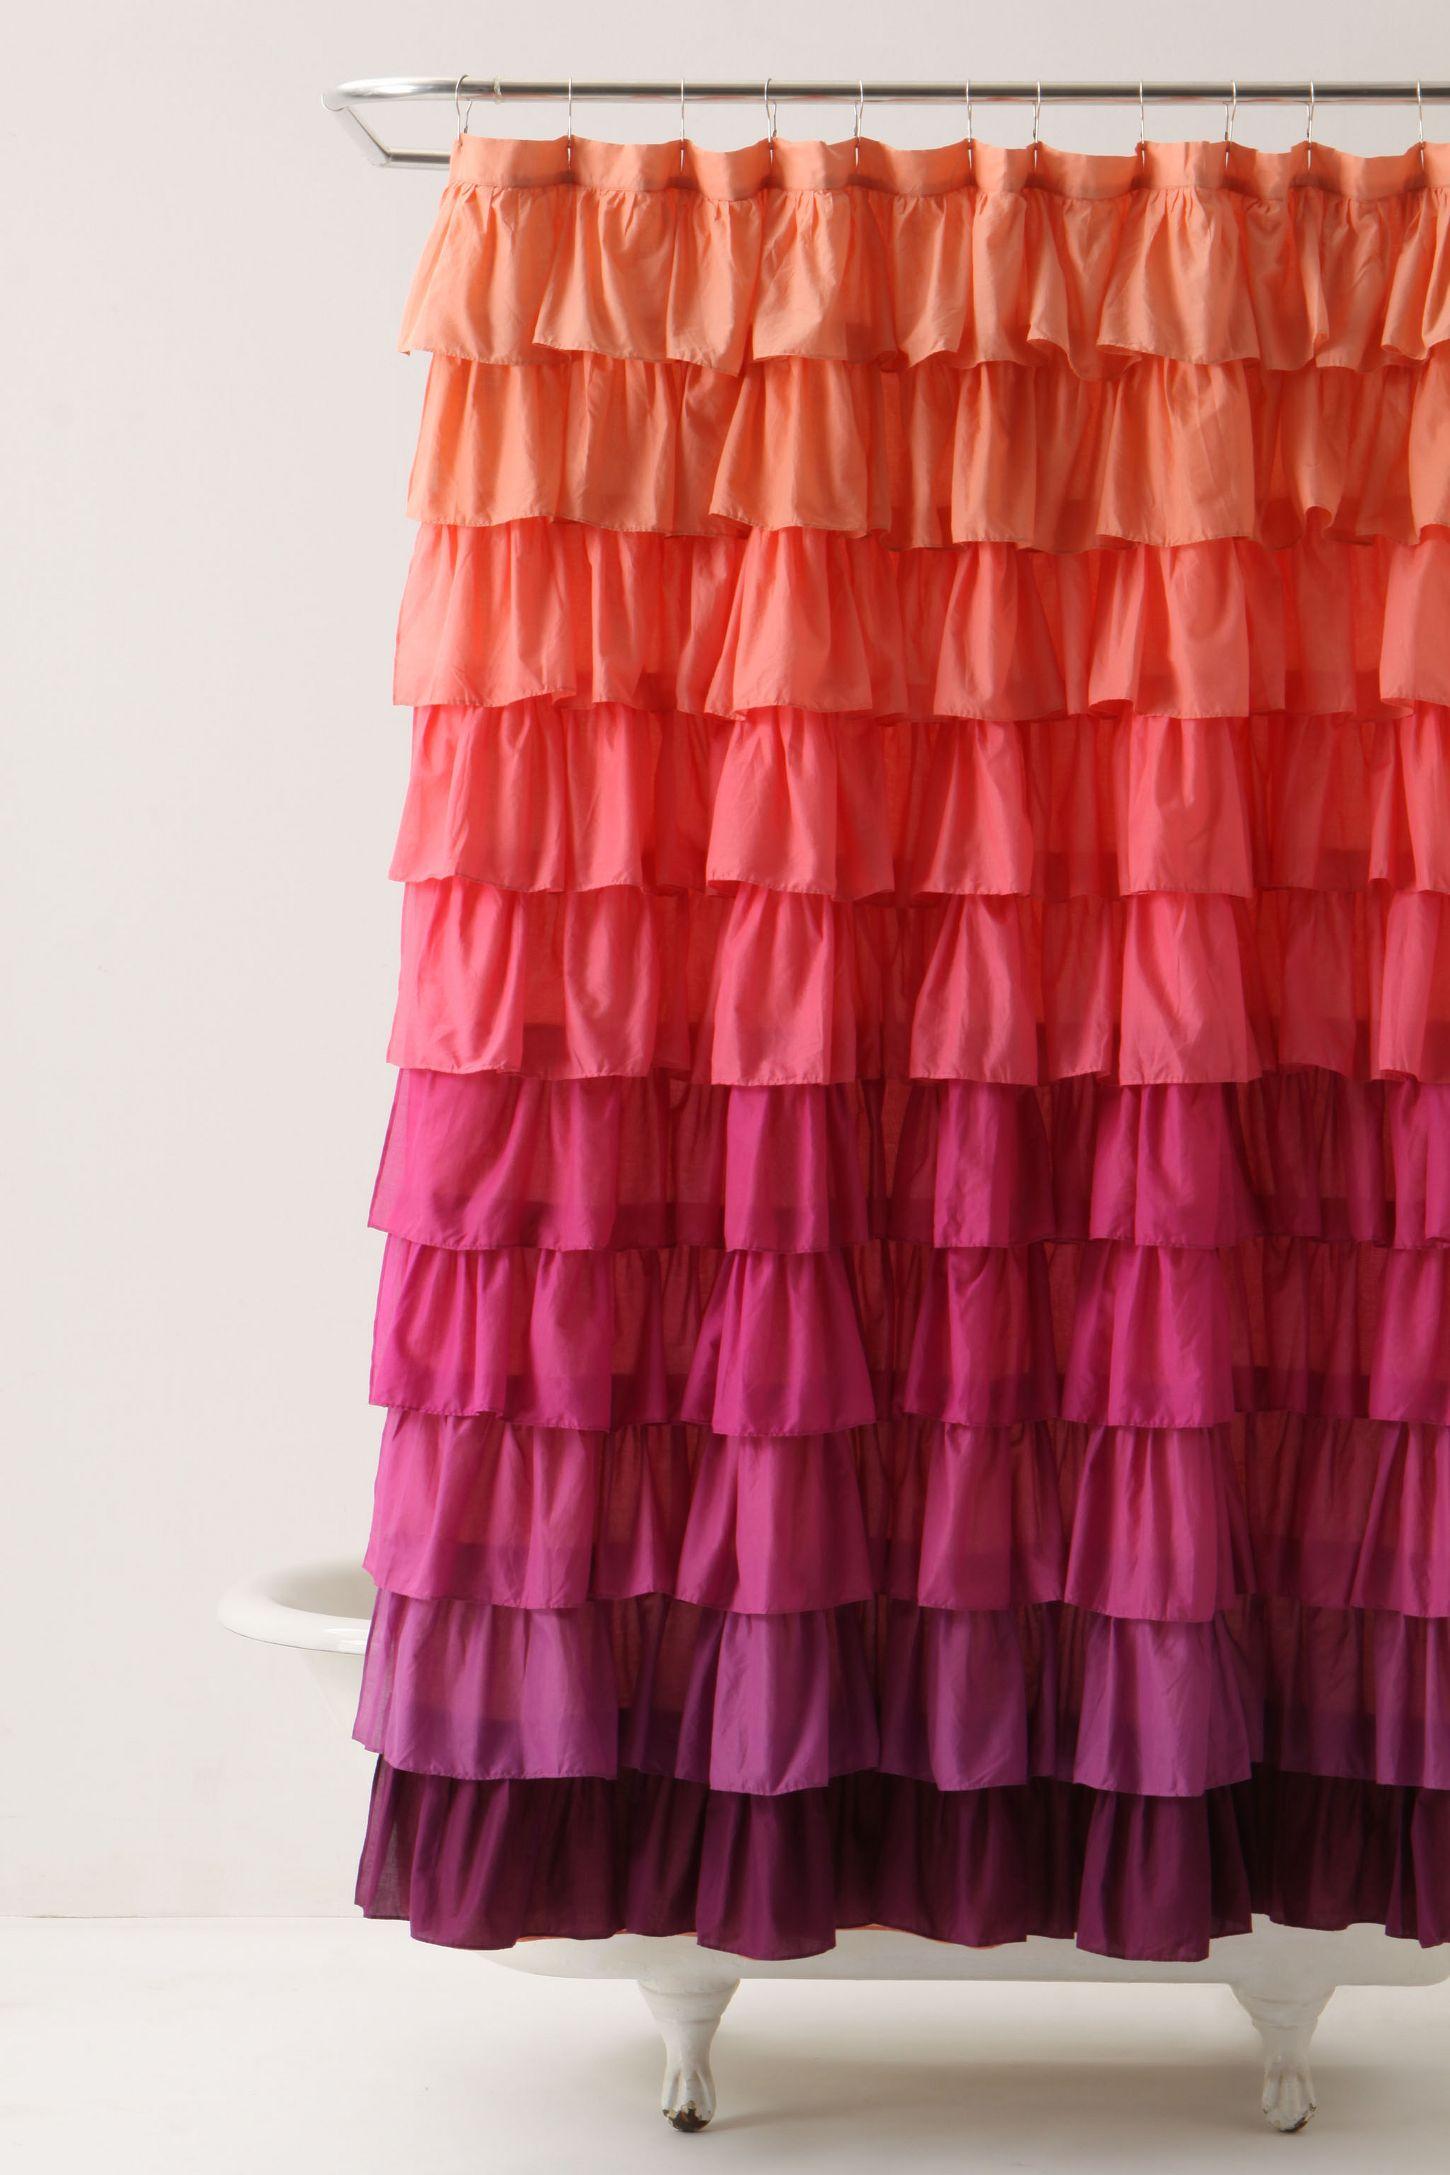 Diy ruffled shower curtain - Diy Ruffled Shower Curtain 46